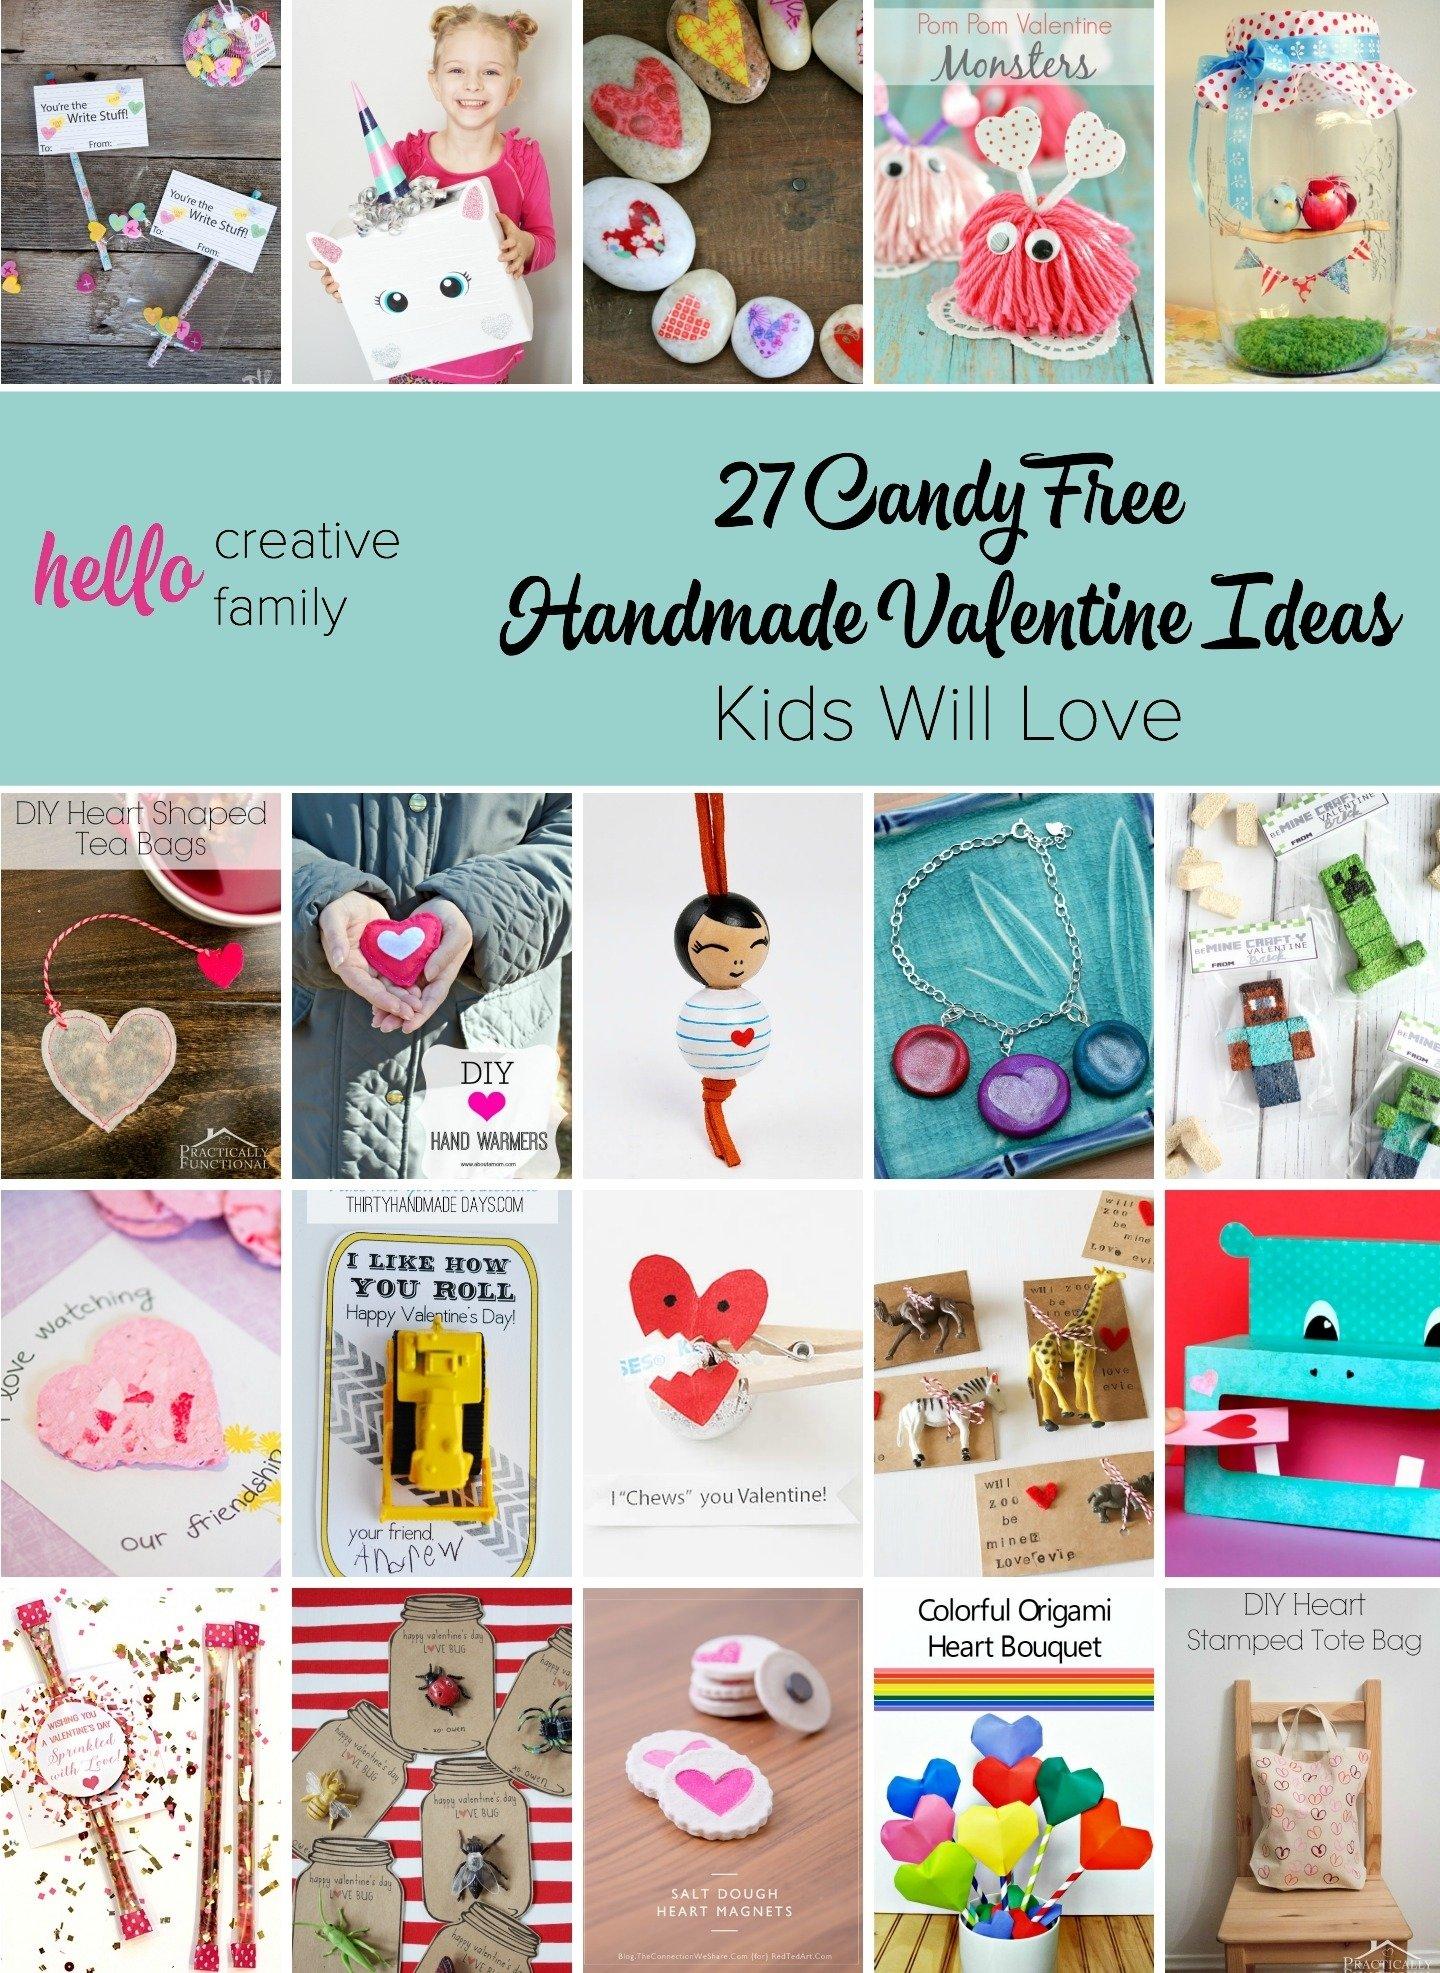 10 Ideal Valentine Gift Ideas For Kids 27 candy free handmade valentine ideas kids will love hello 2020